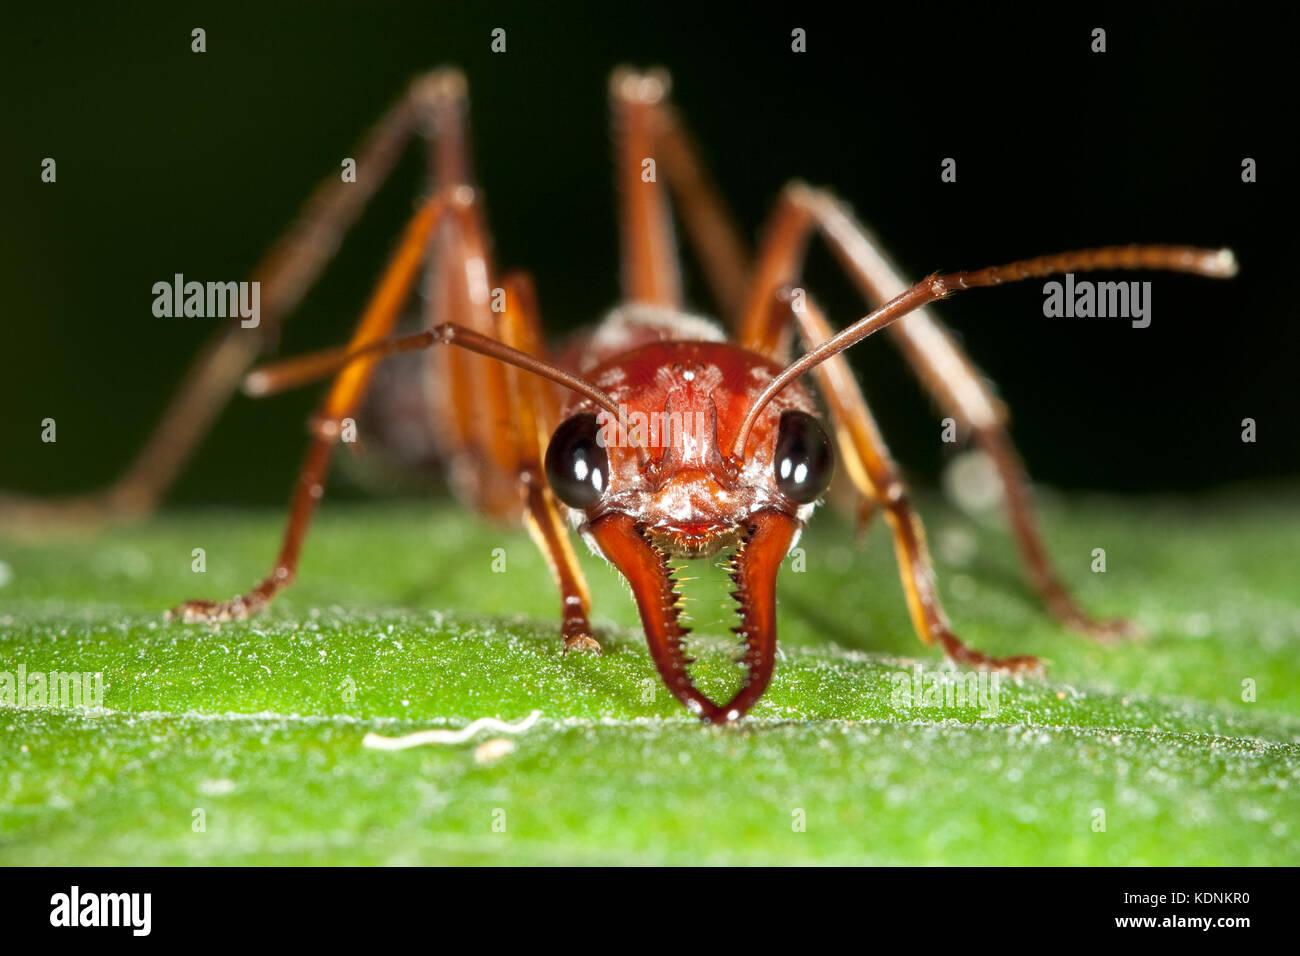 Brown Bulldog Ant (Myrmecia brevinoda) in defensive posture on leaf. Hopkins Creek. New South Wales. Australia. Stock Photo